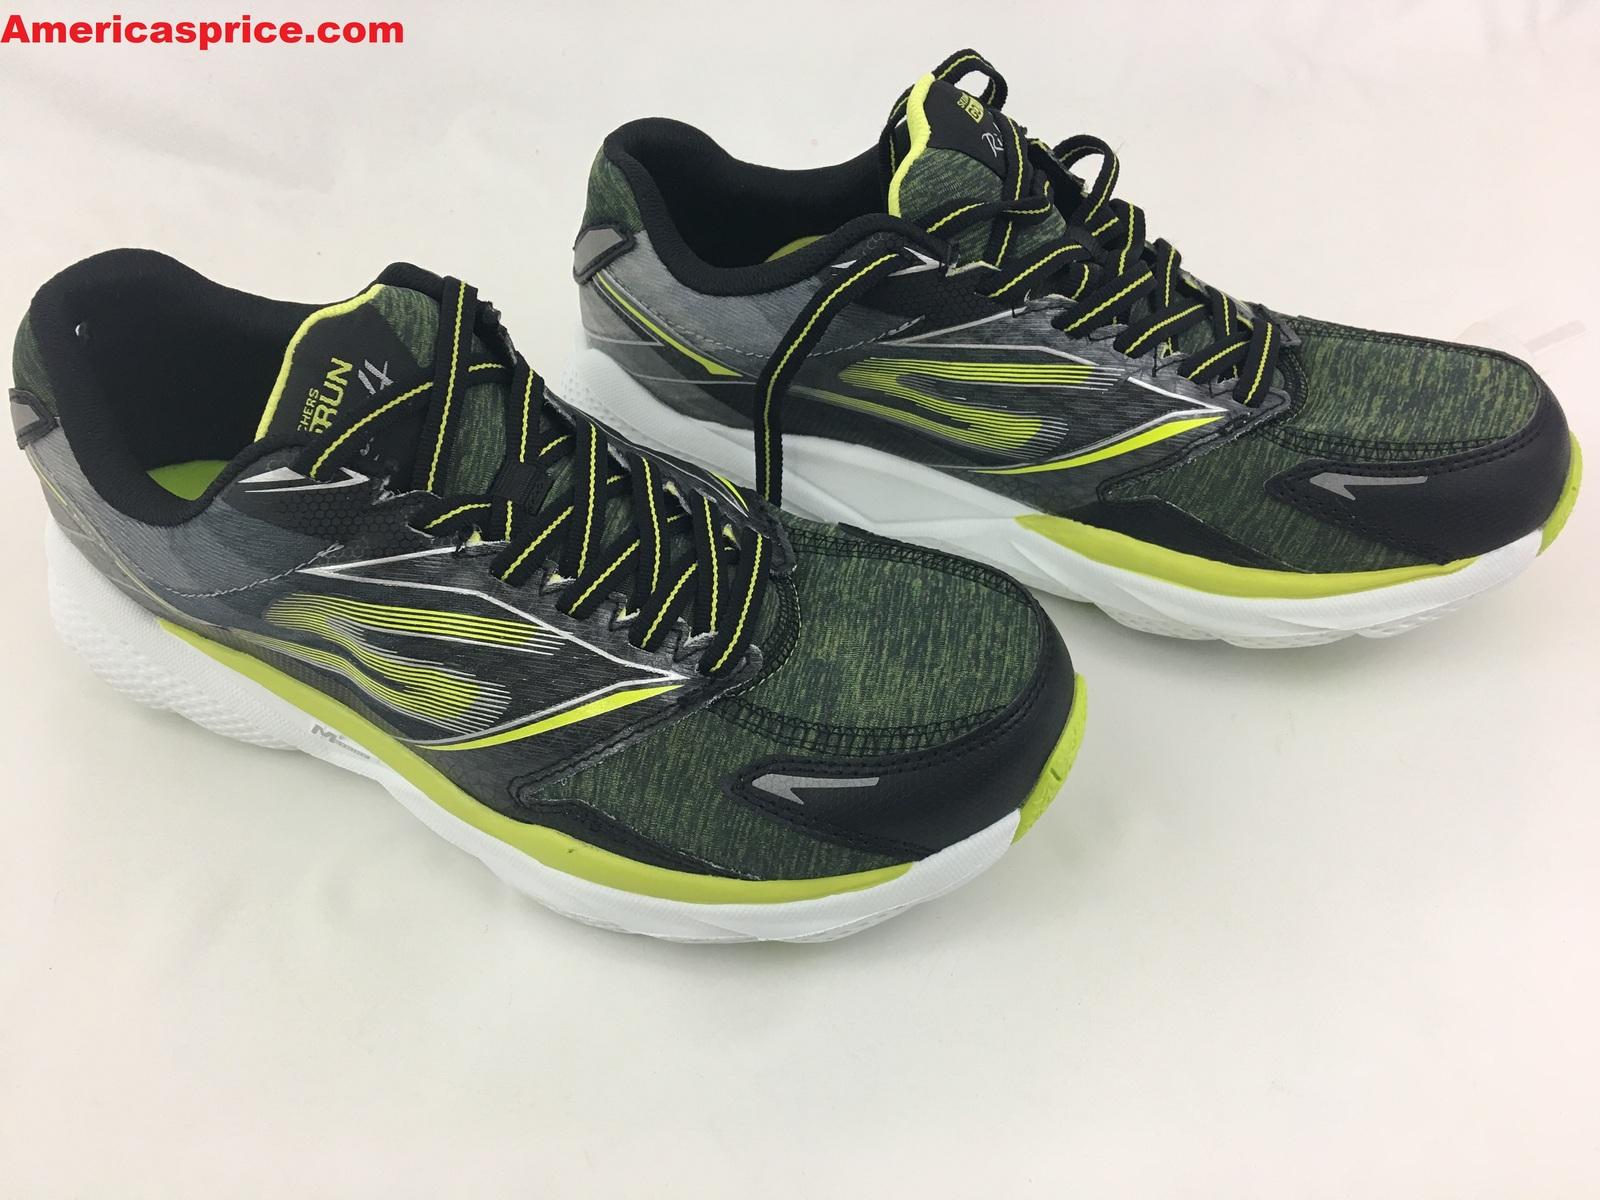 d0d8287d92f9 Img 0458. Img 0458. Skechers 53999 BKLM Men s GOrun RIDE 4-EXCESS Running  Shoes Size 7.5. Skechers 53999 BKLM Men s GOrun RIDE ...